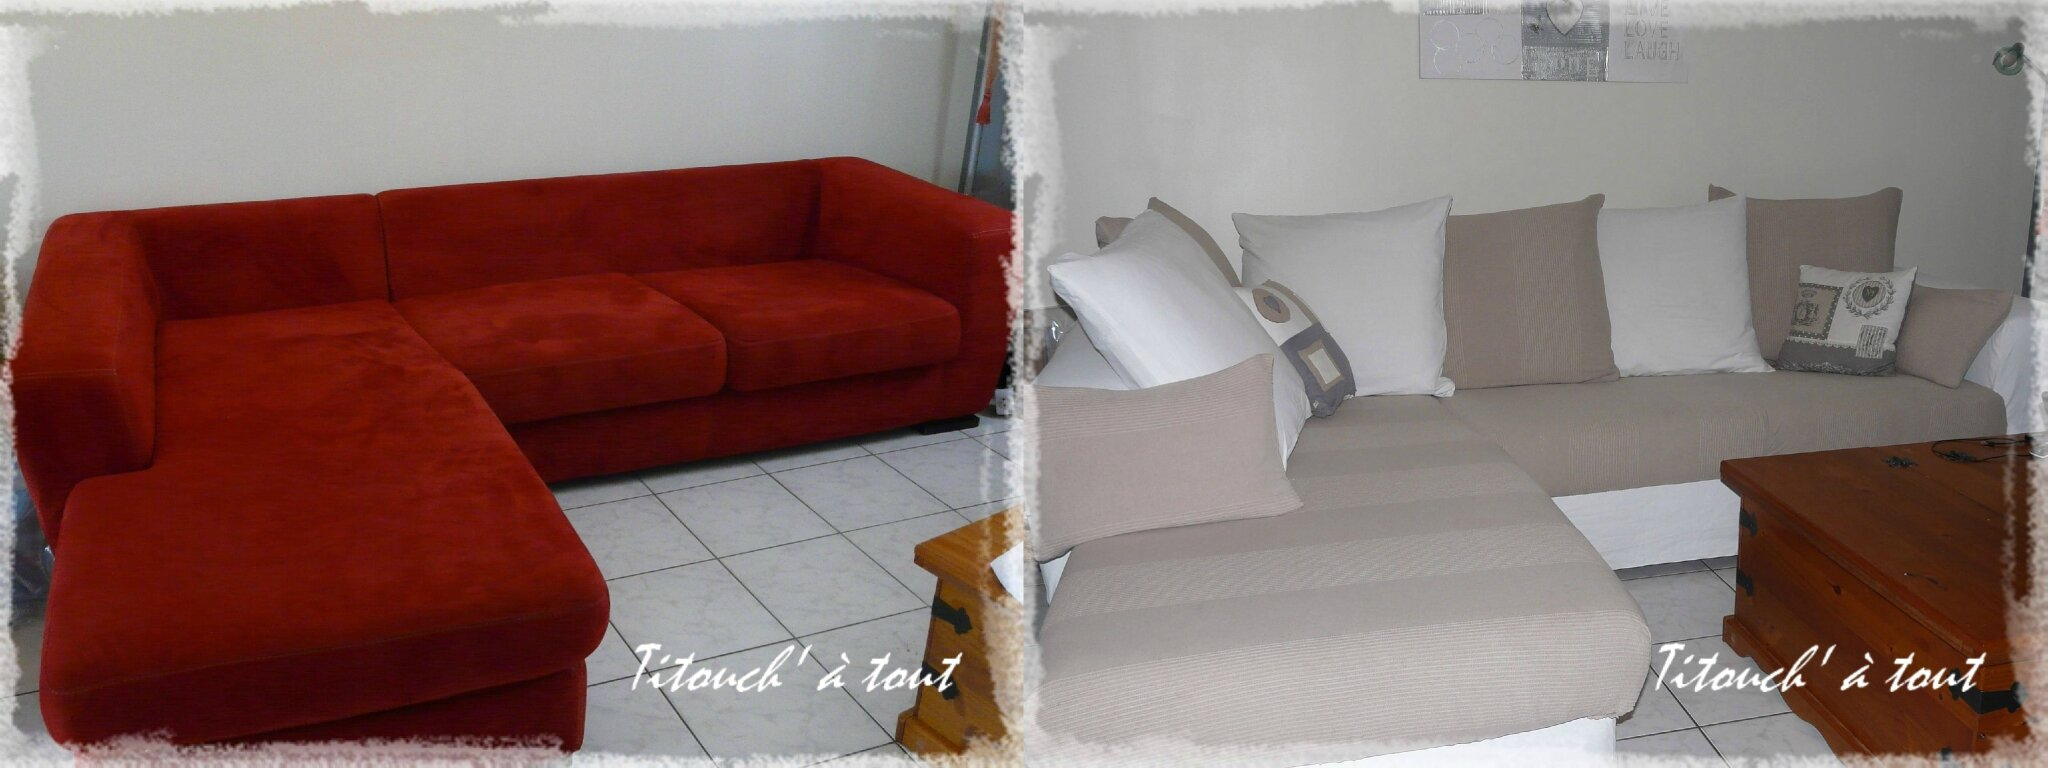 100 Fantastique Suggestions Relooker Un Canape En Cuir